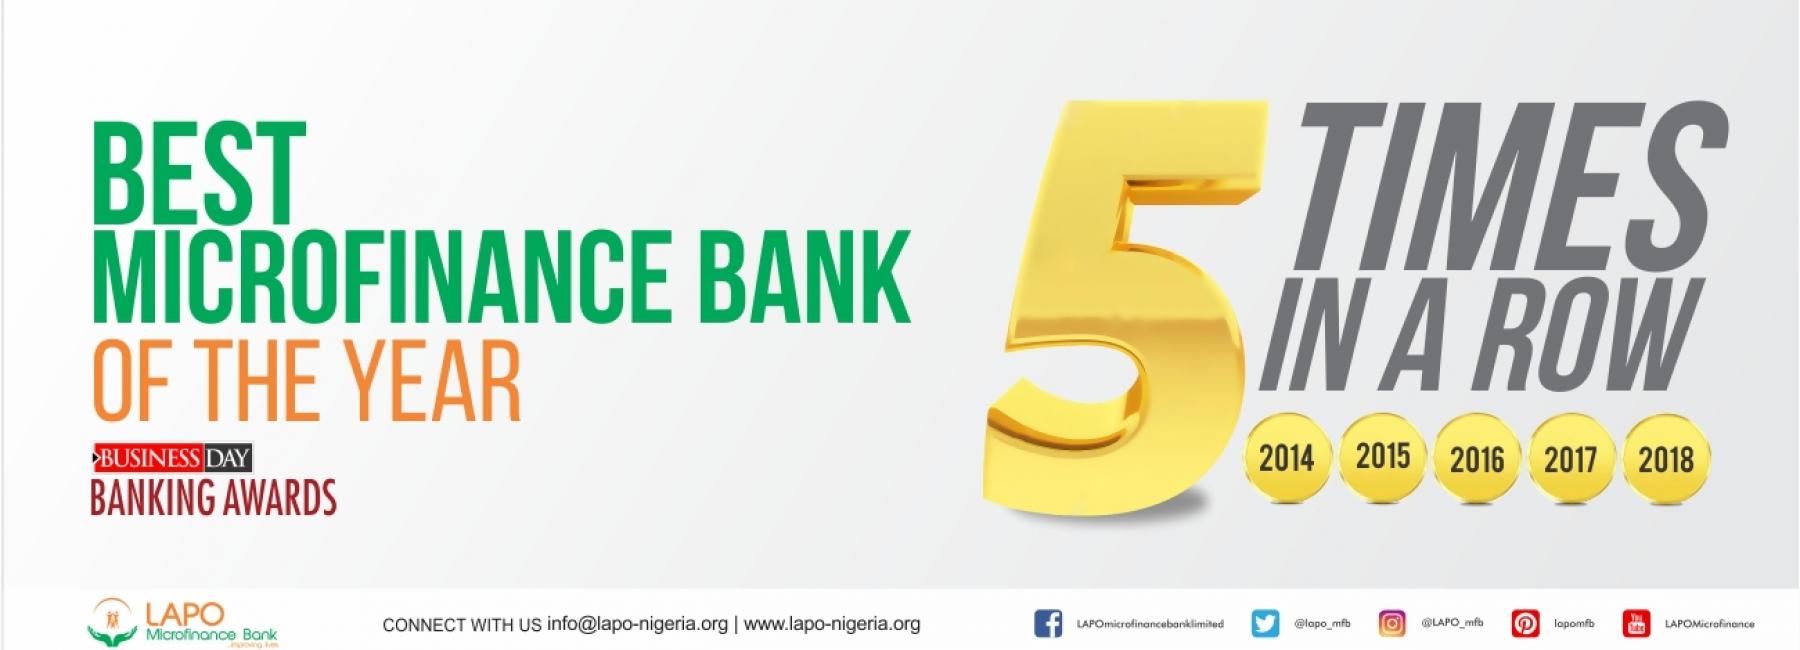 LAPO Microfinance Bank